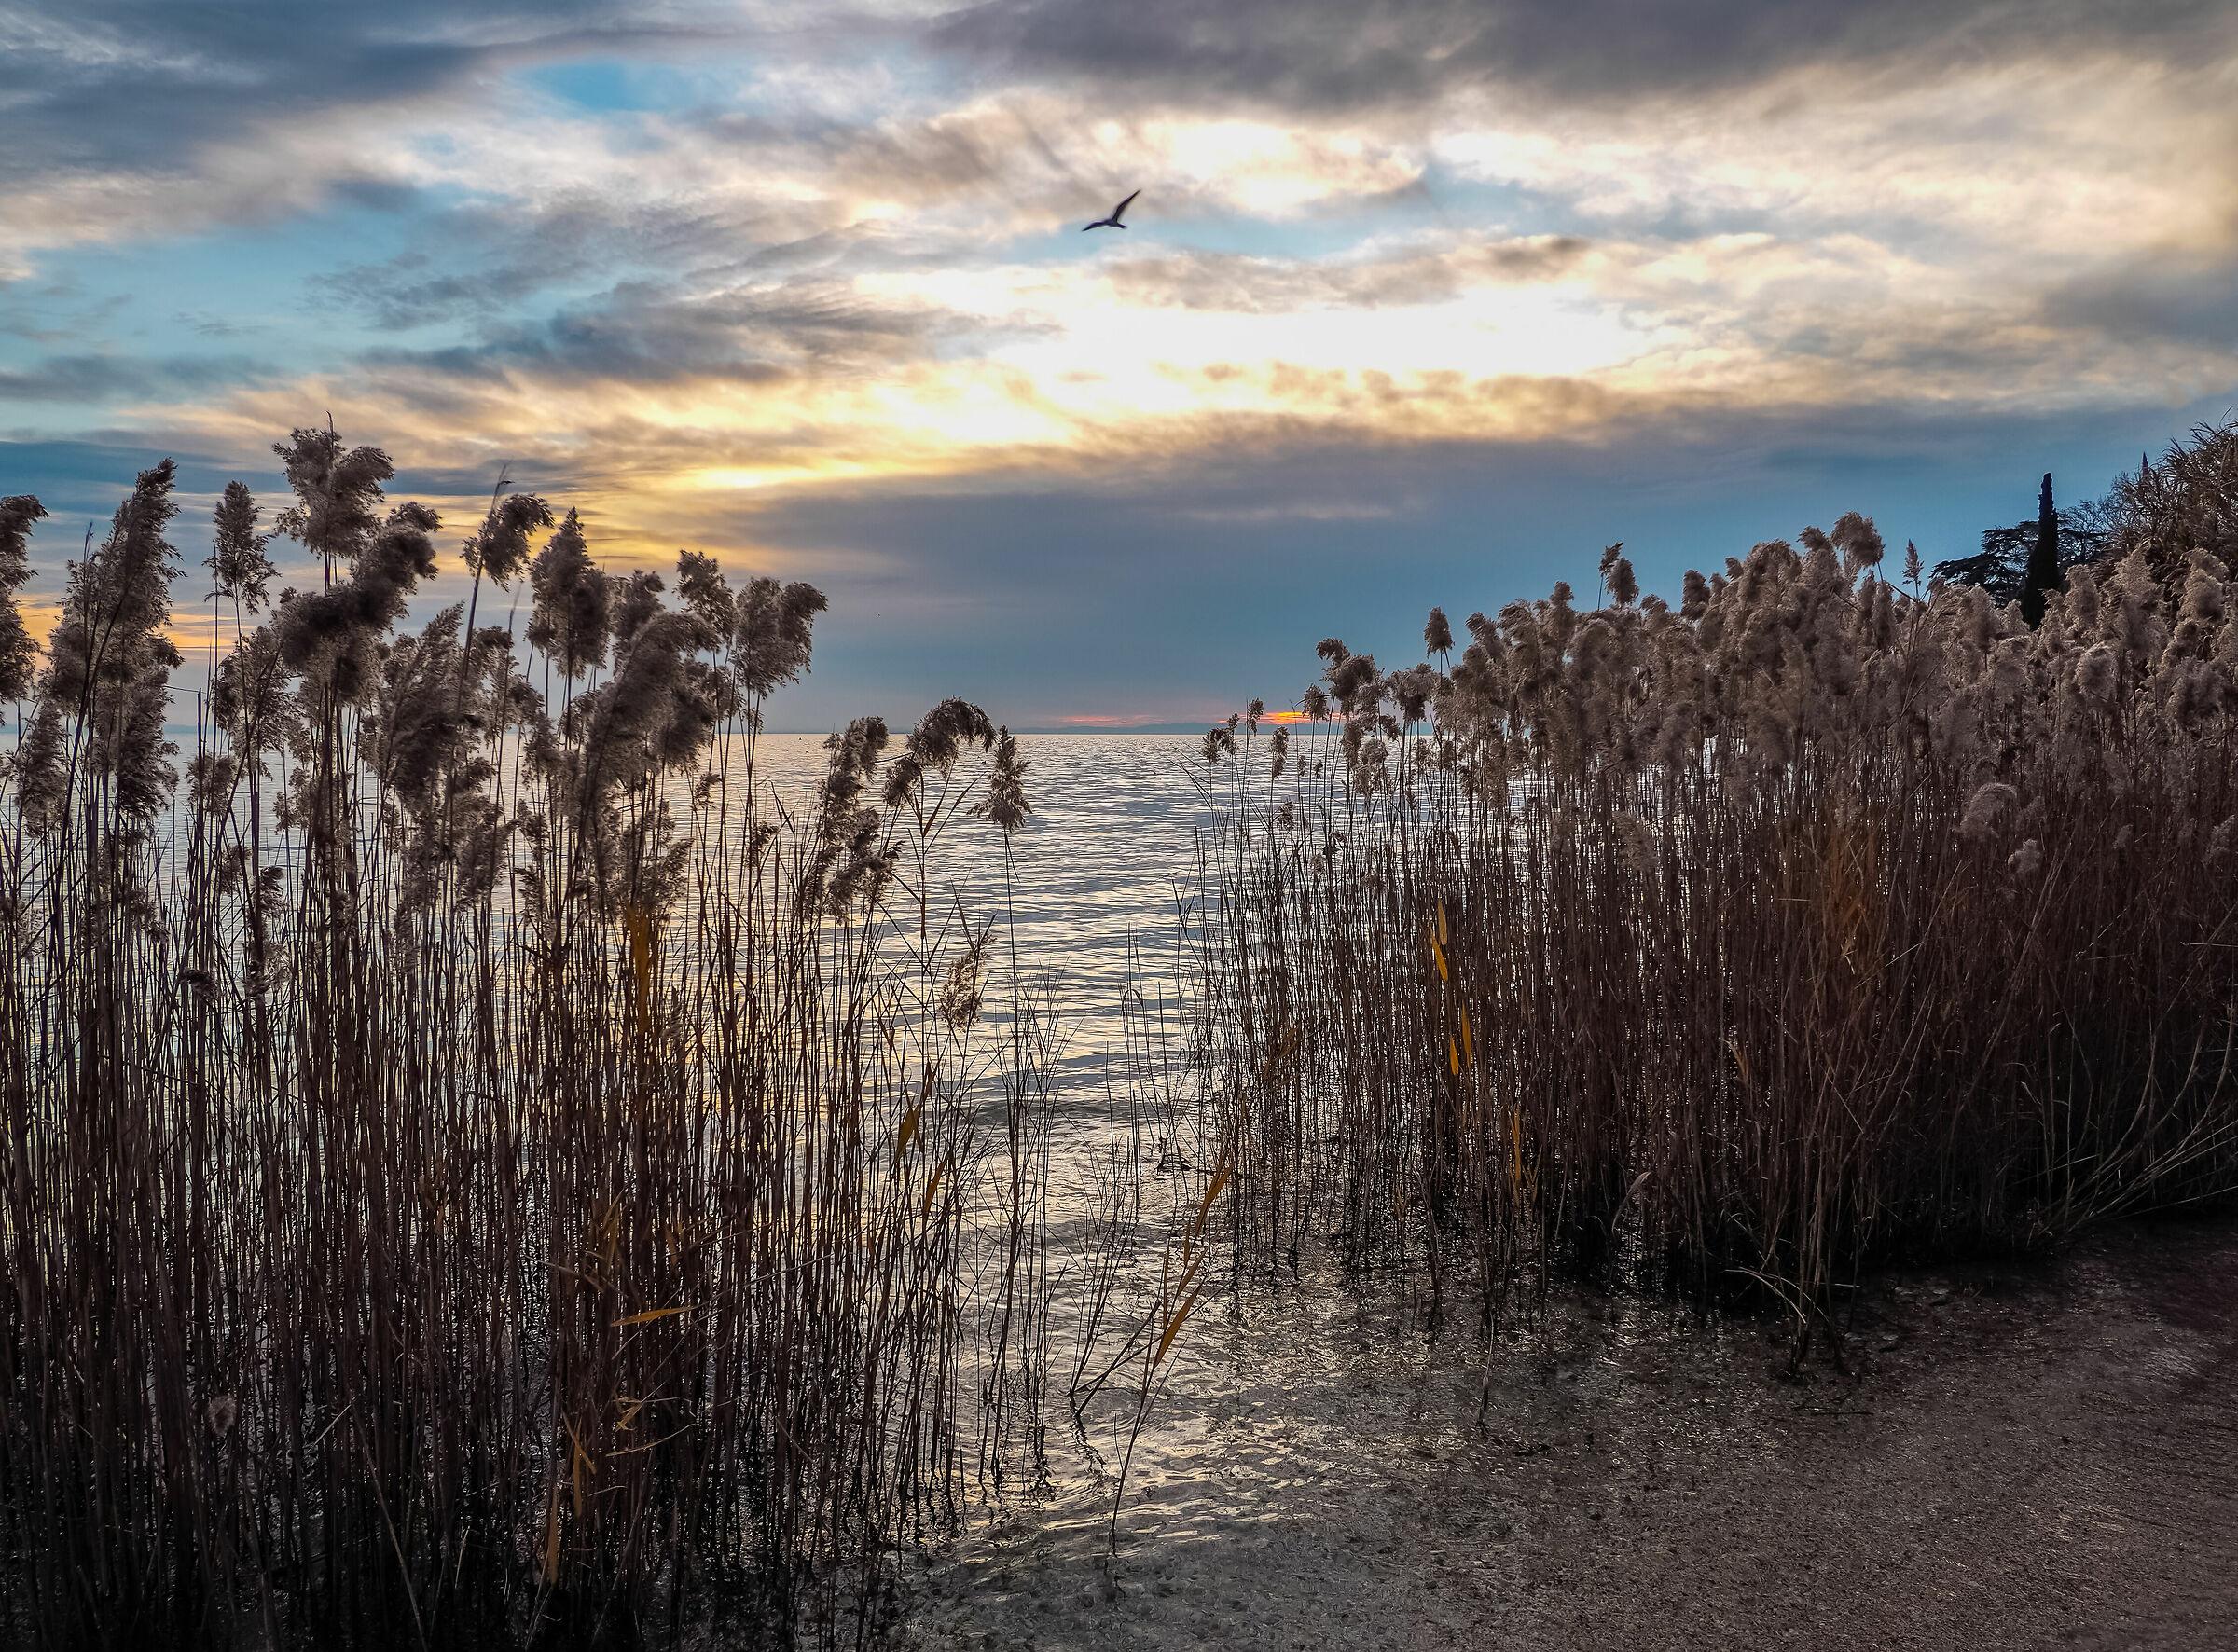 walk among the reeds...